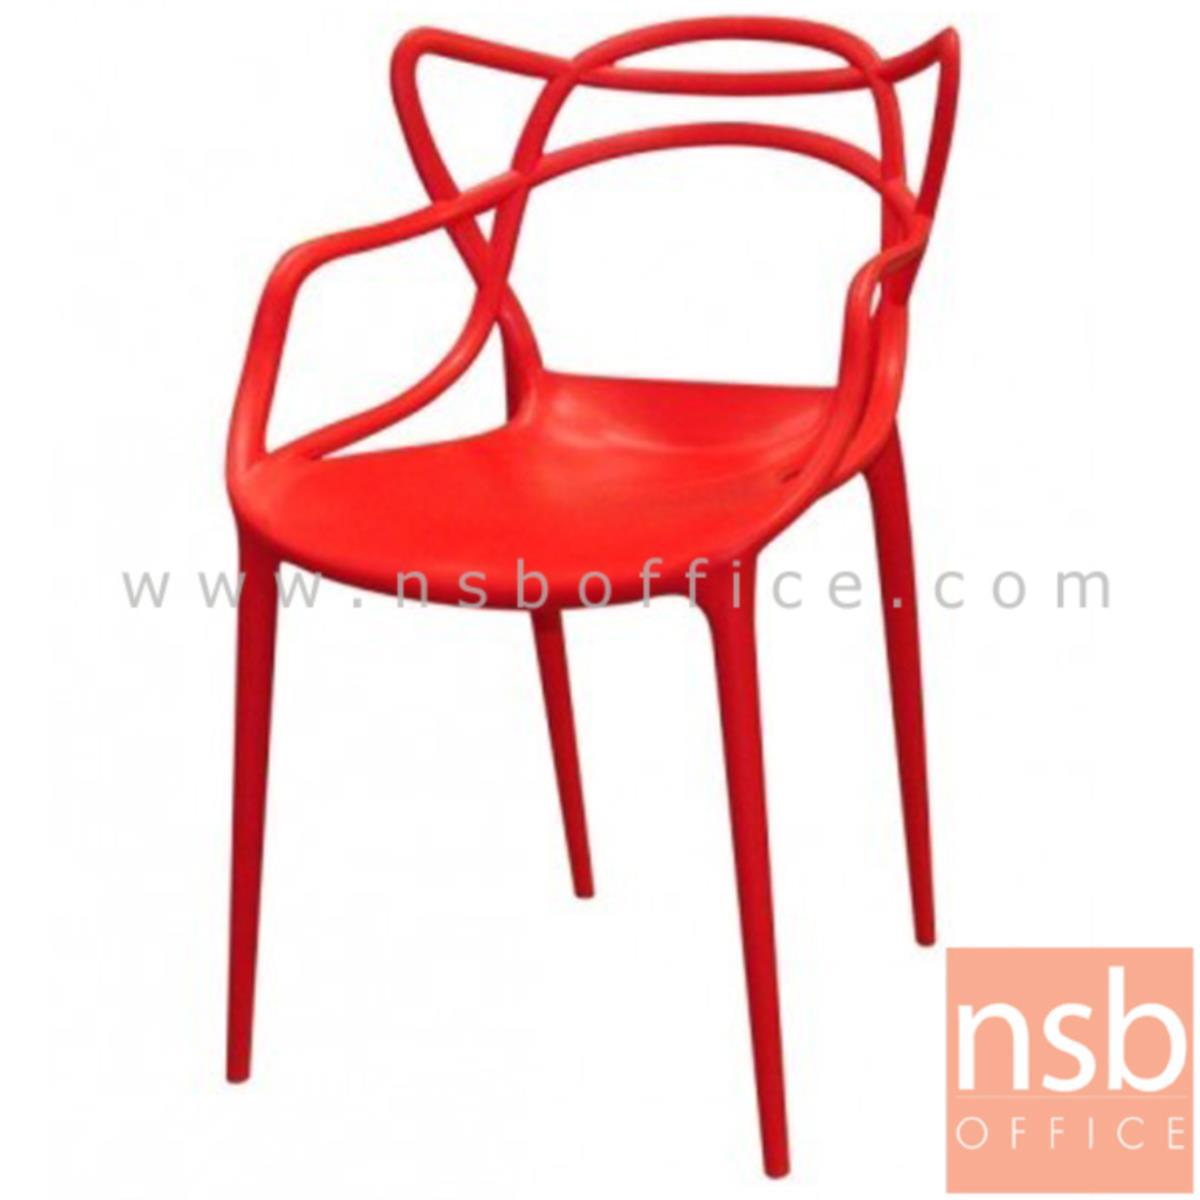 B05A094:เก้าอี้โมเดิร์นพลาสติกล้วน(PP) รุ่น Ventimiglia (เวนติมิเลีย) ขนาด 56W cm.